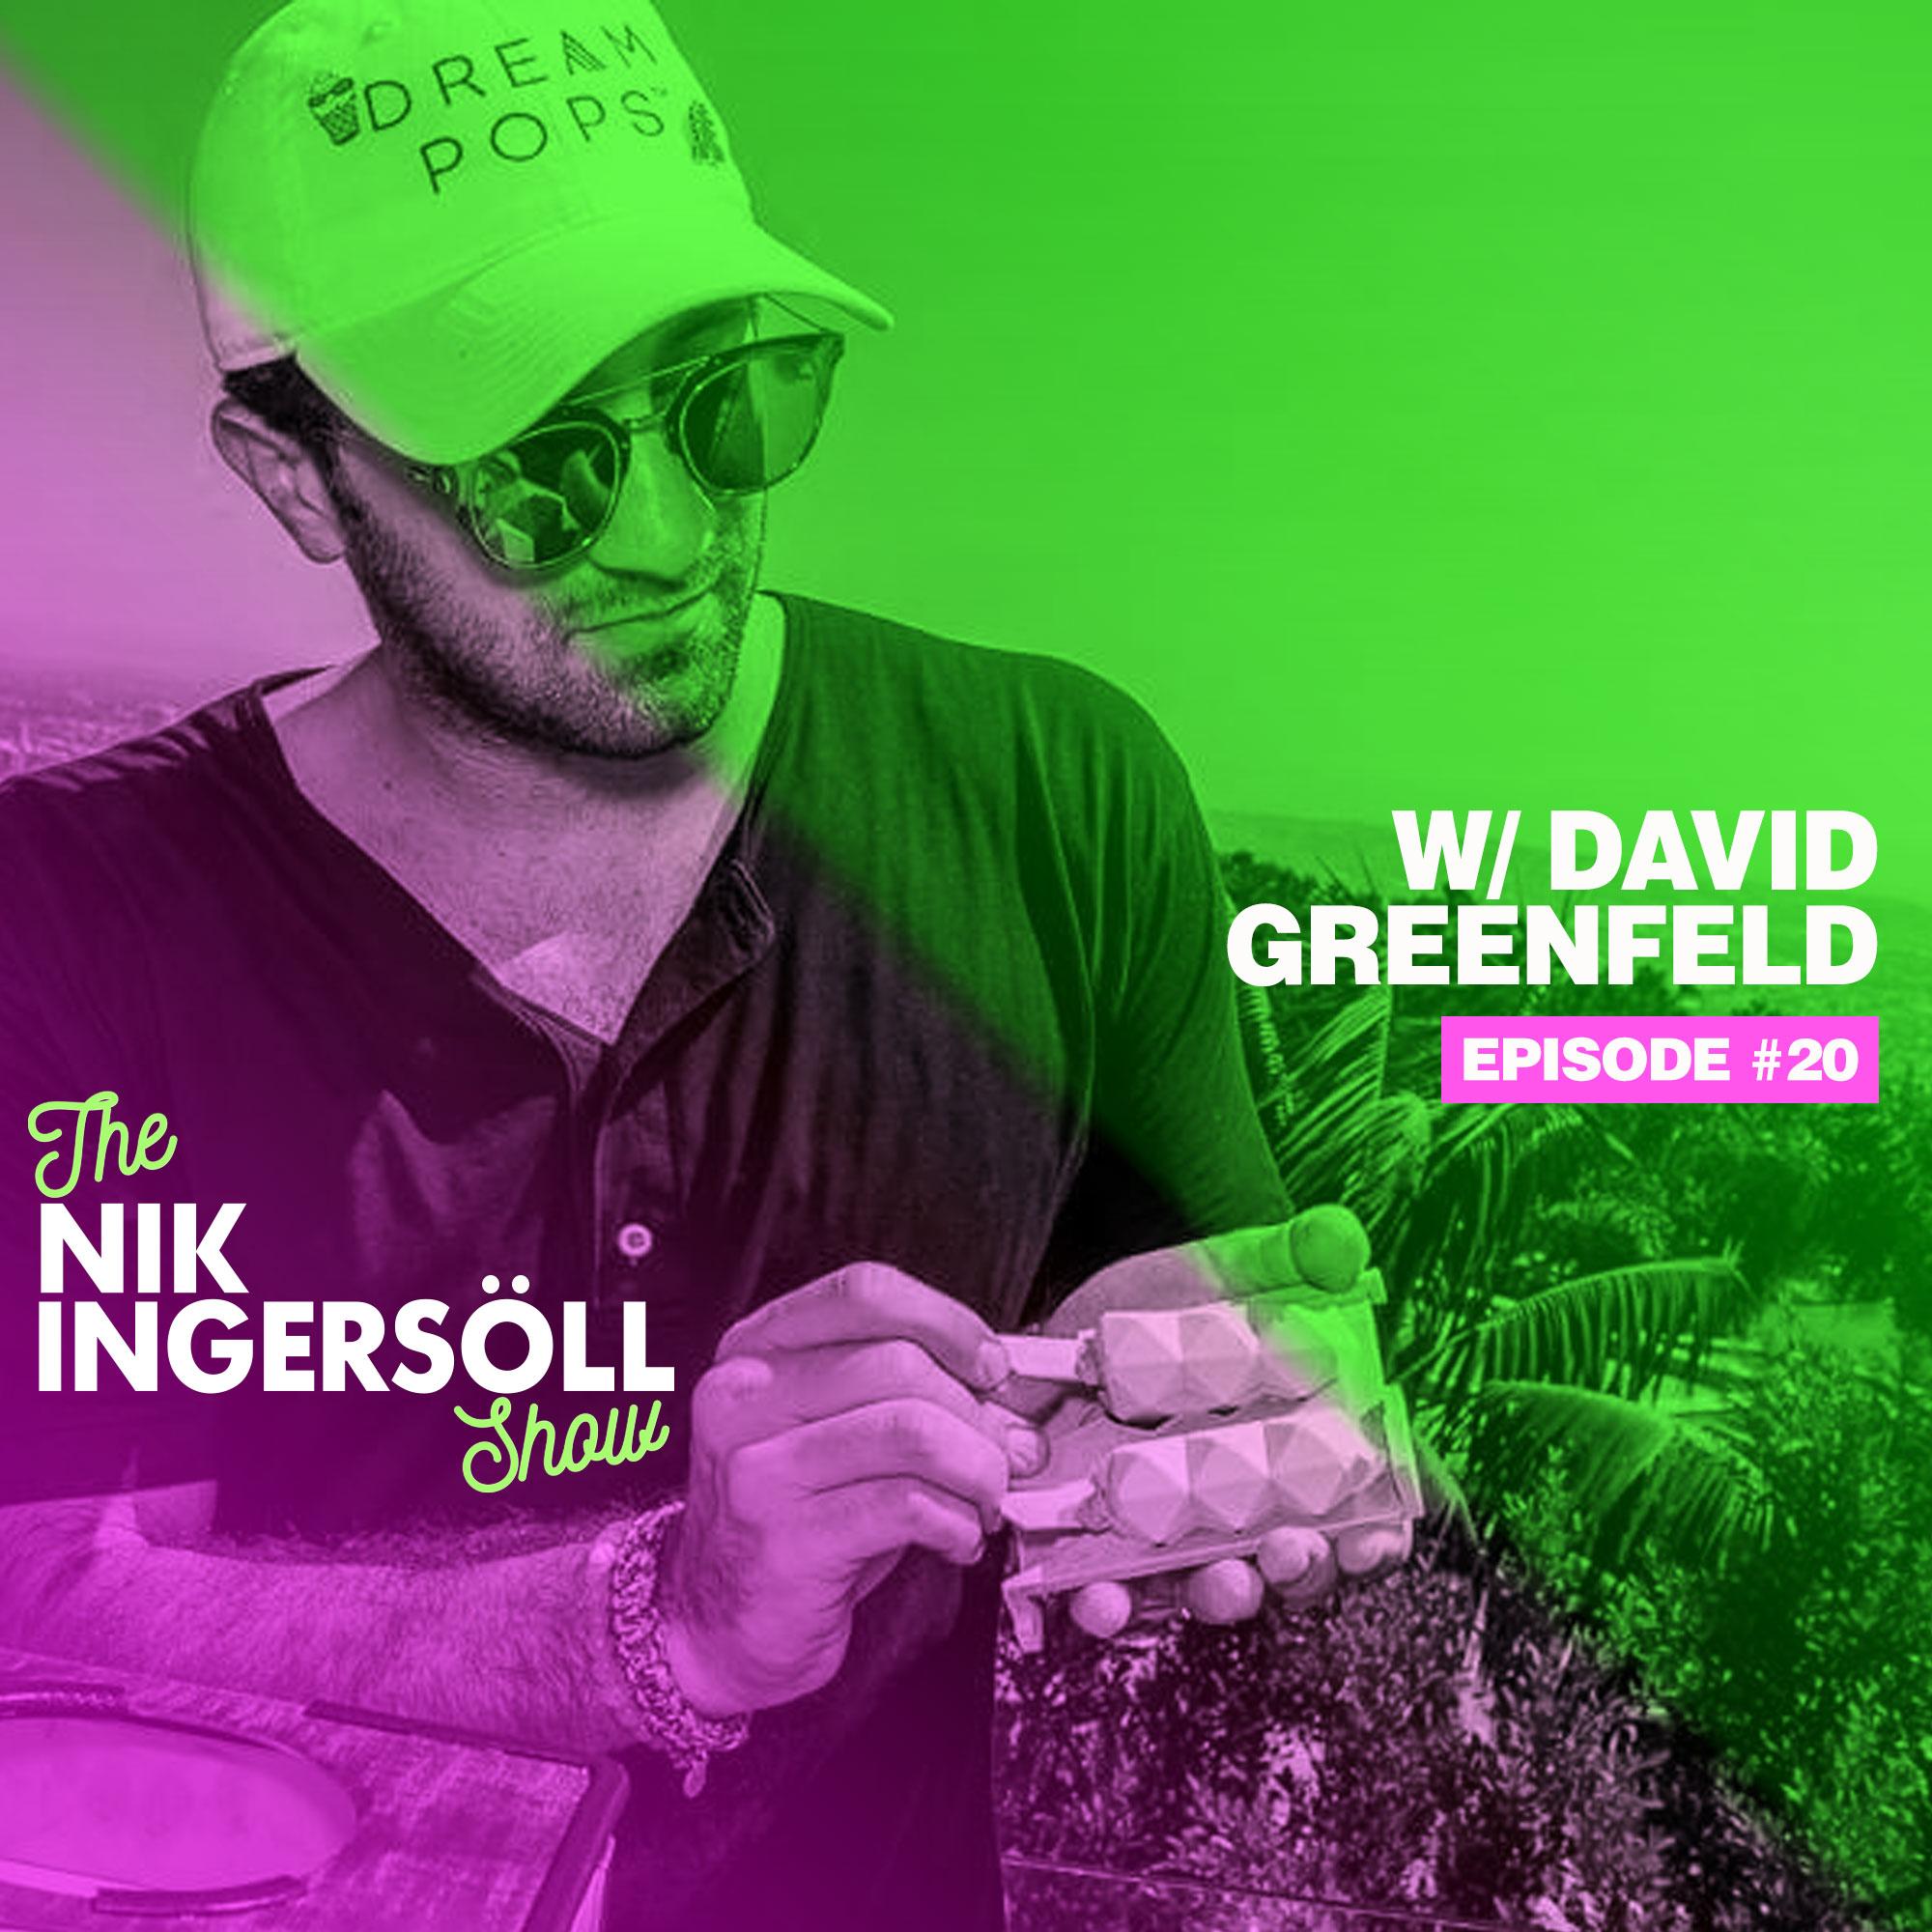 The Nik Ingersoll Show